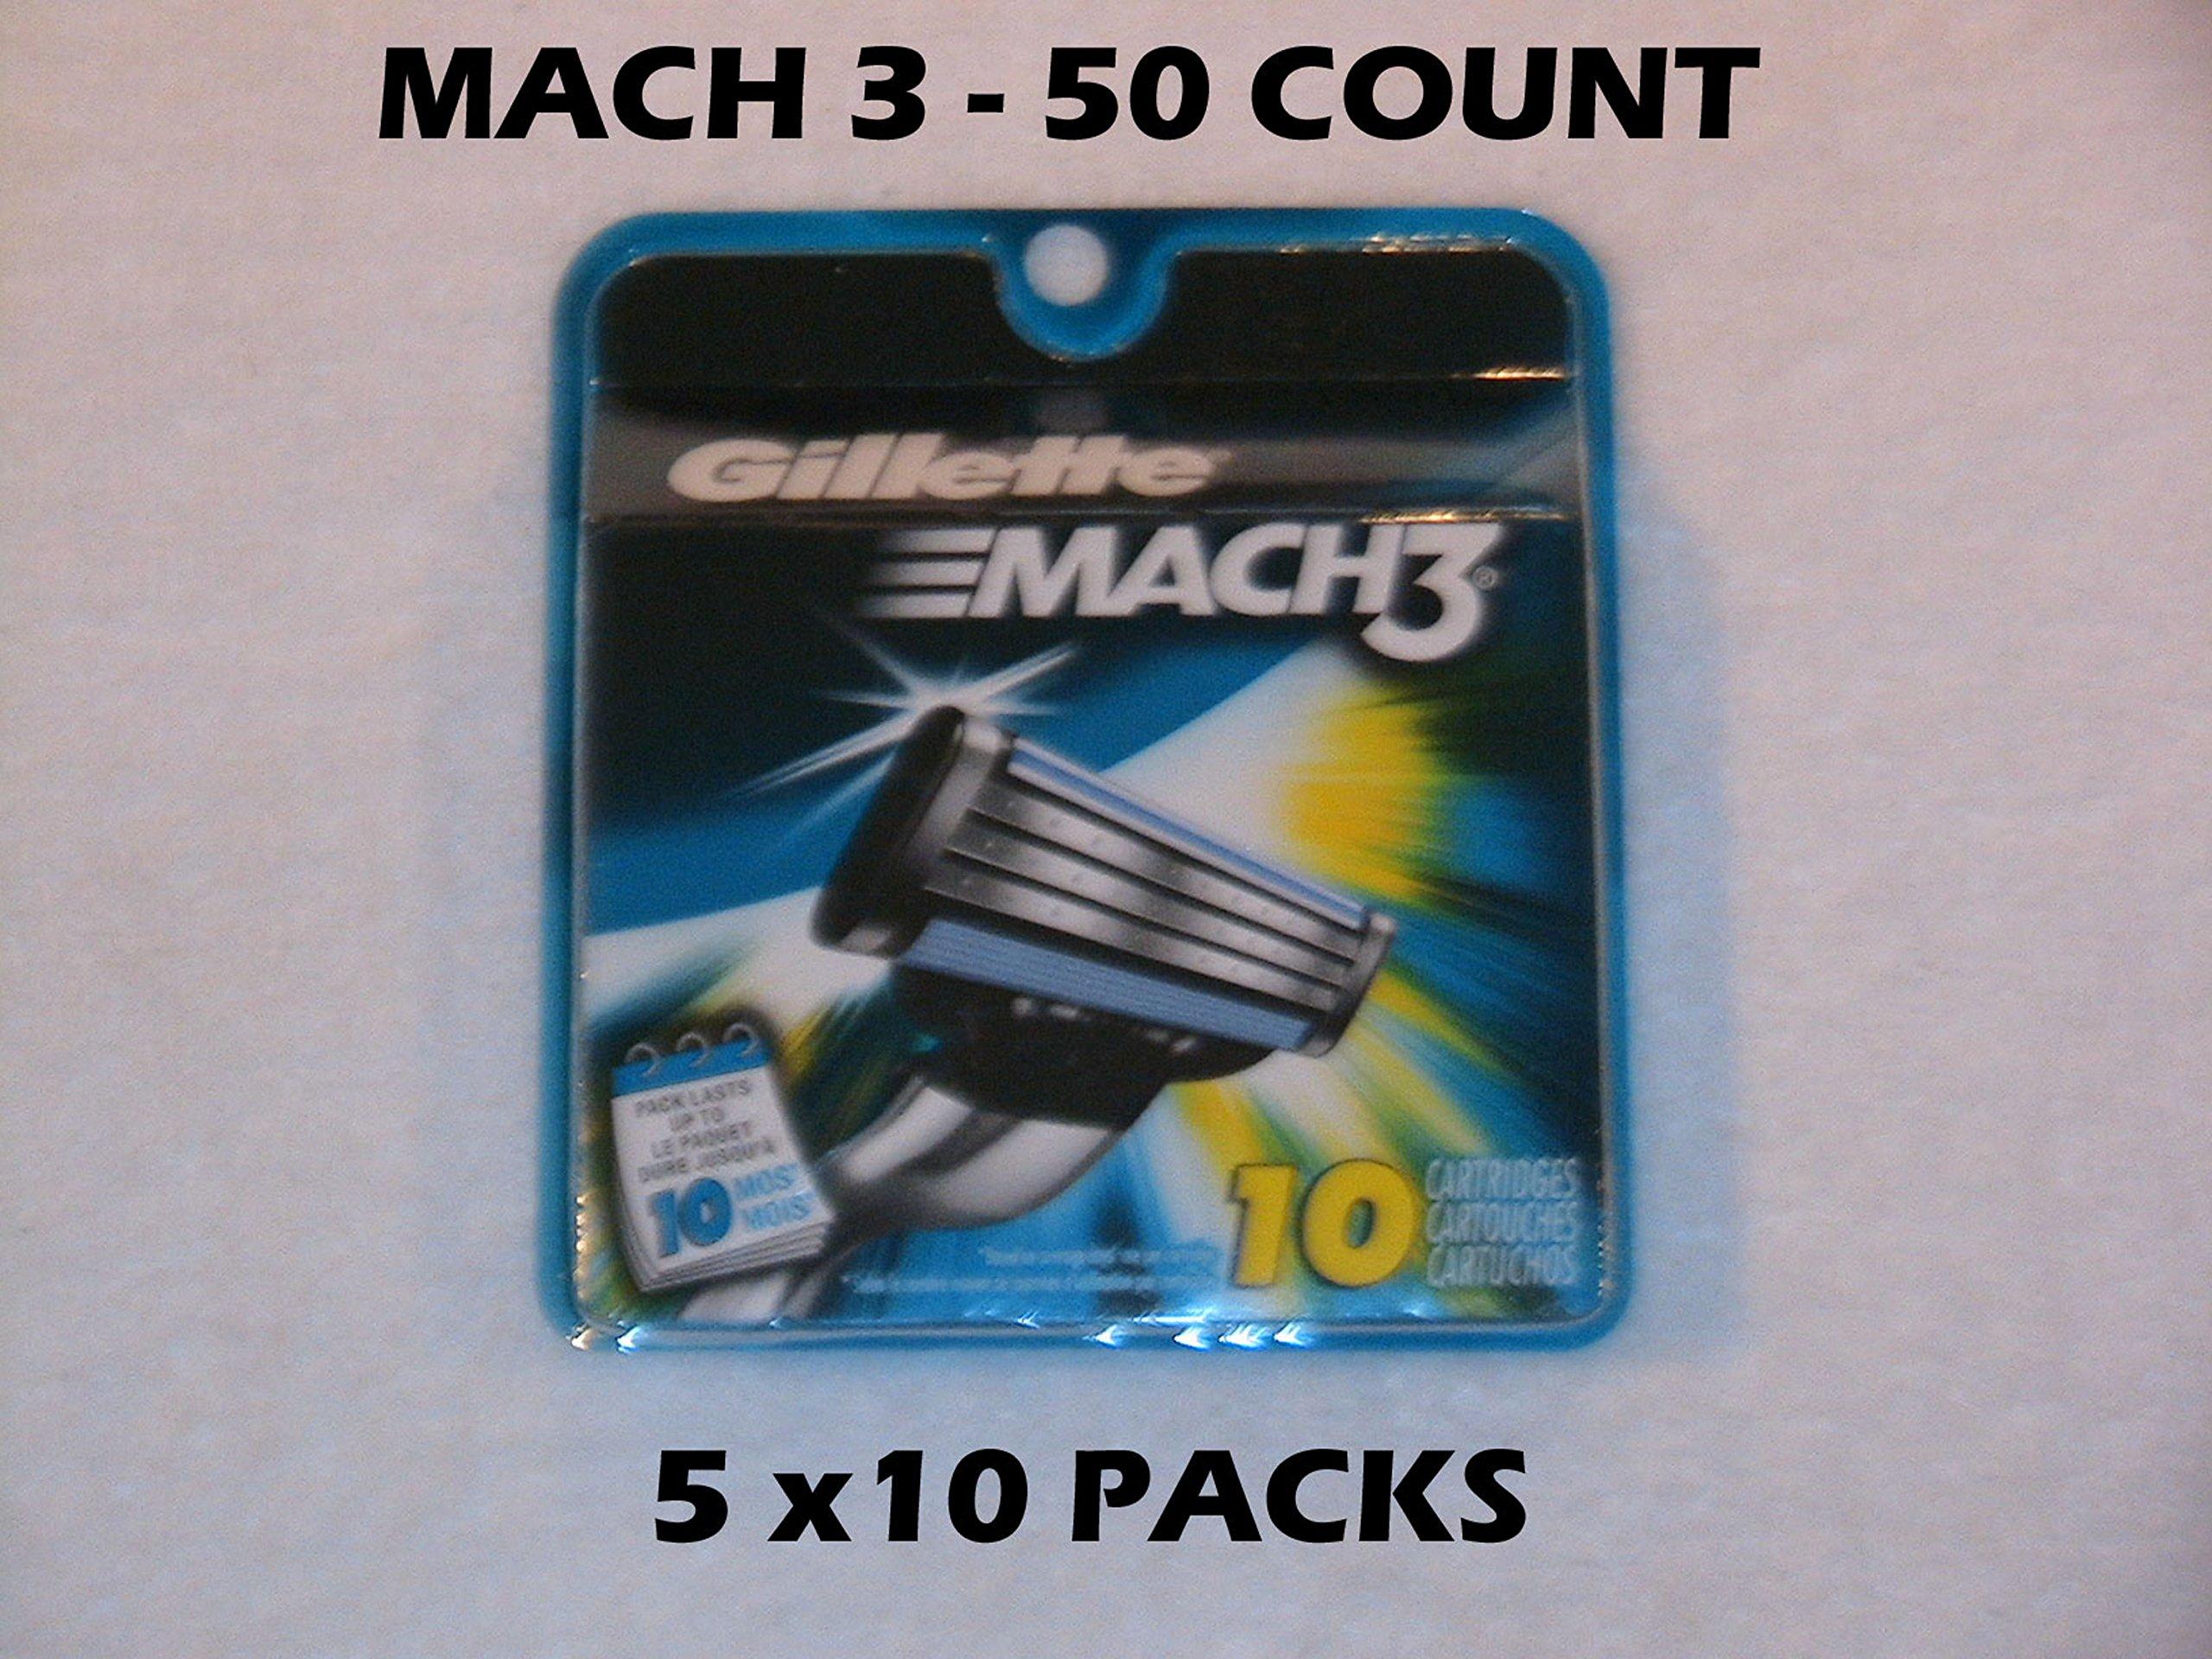 Gillette Mach 3 - 50 Count (5 x 10 Packs)